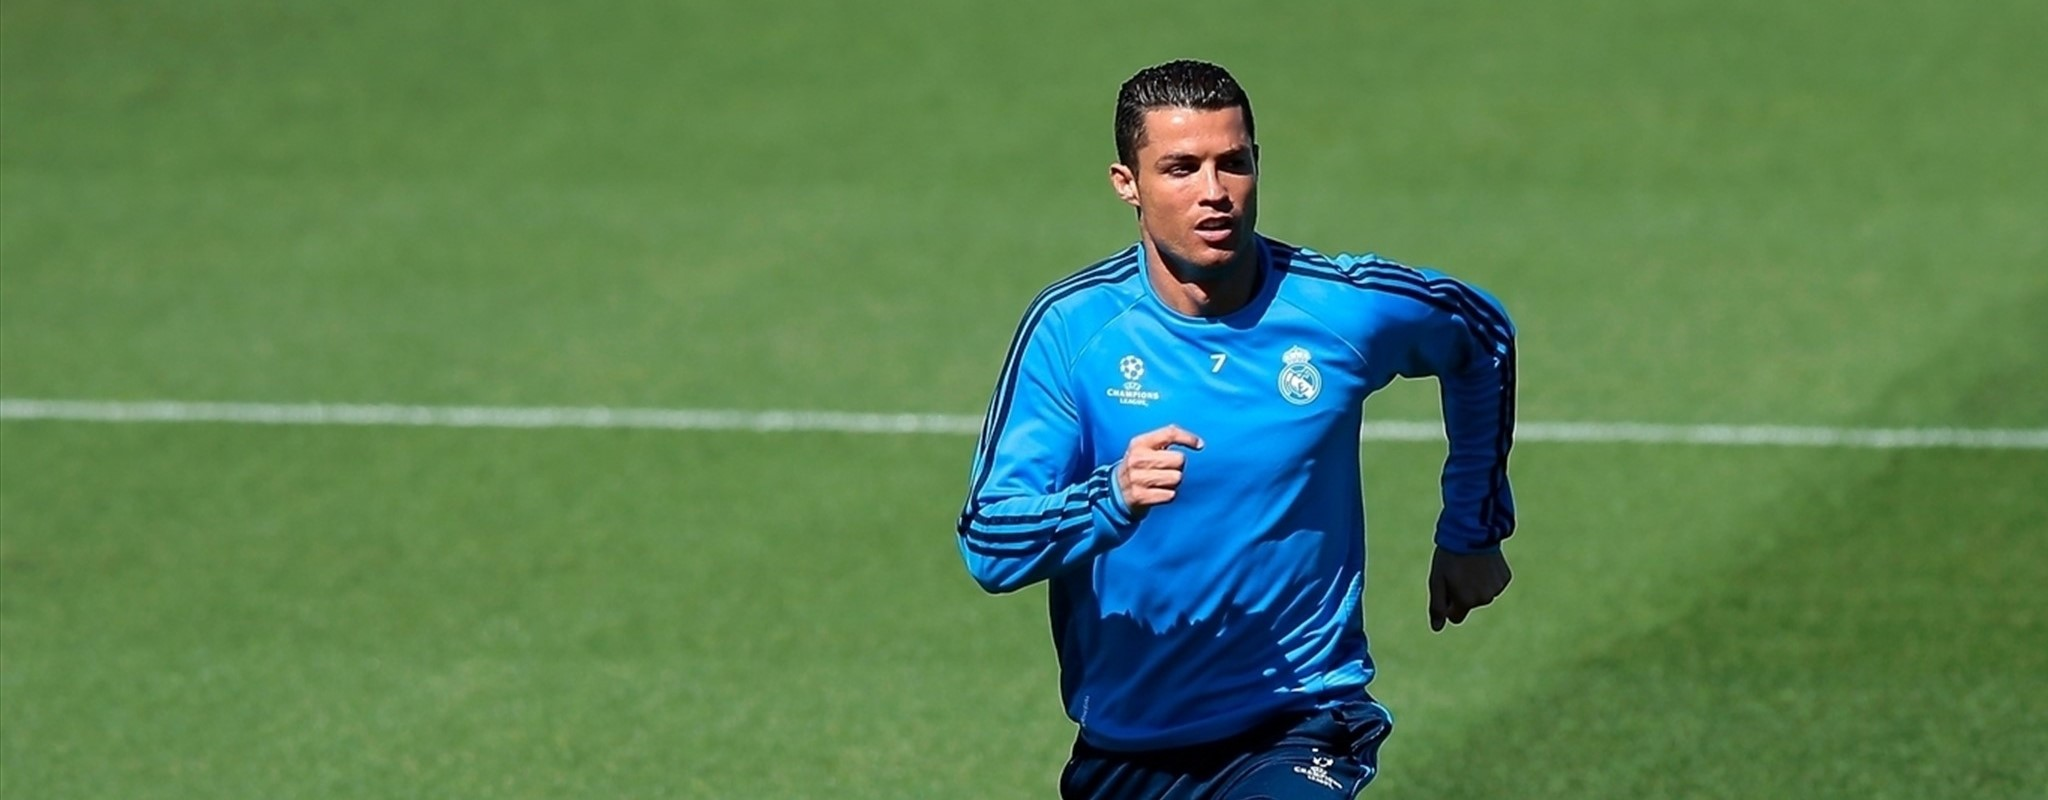 Real Madrid finalista. Derrota al Manchester City 1-0.